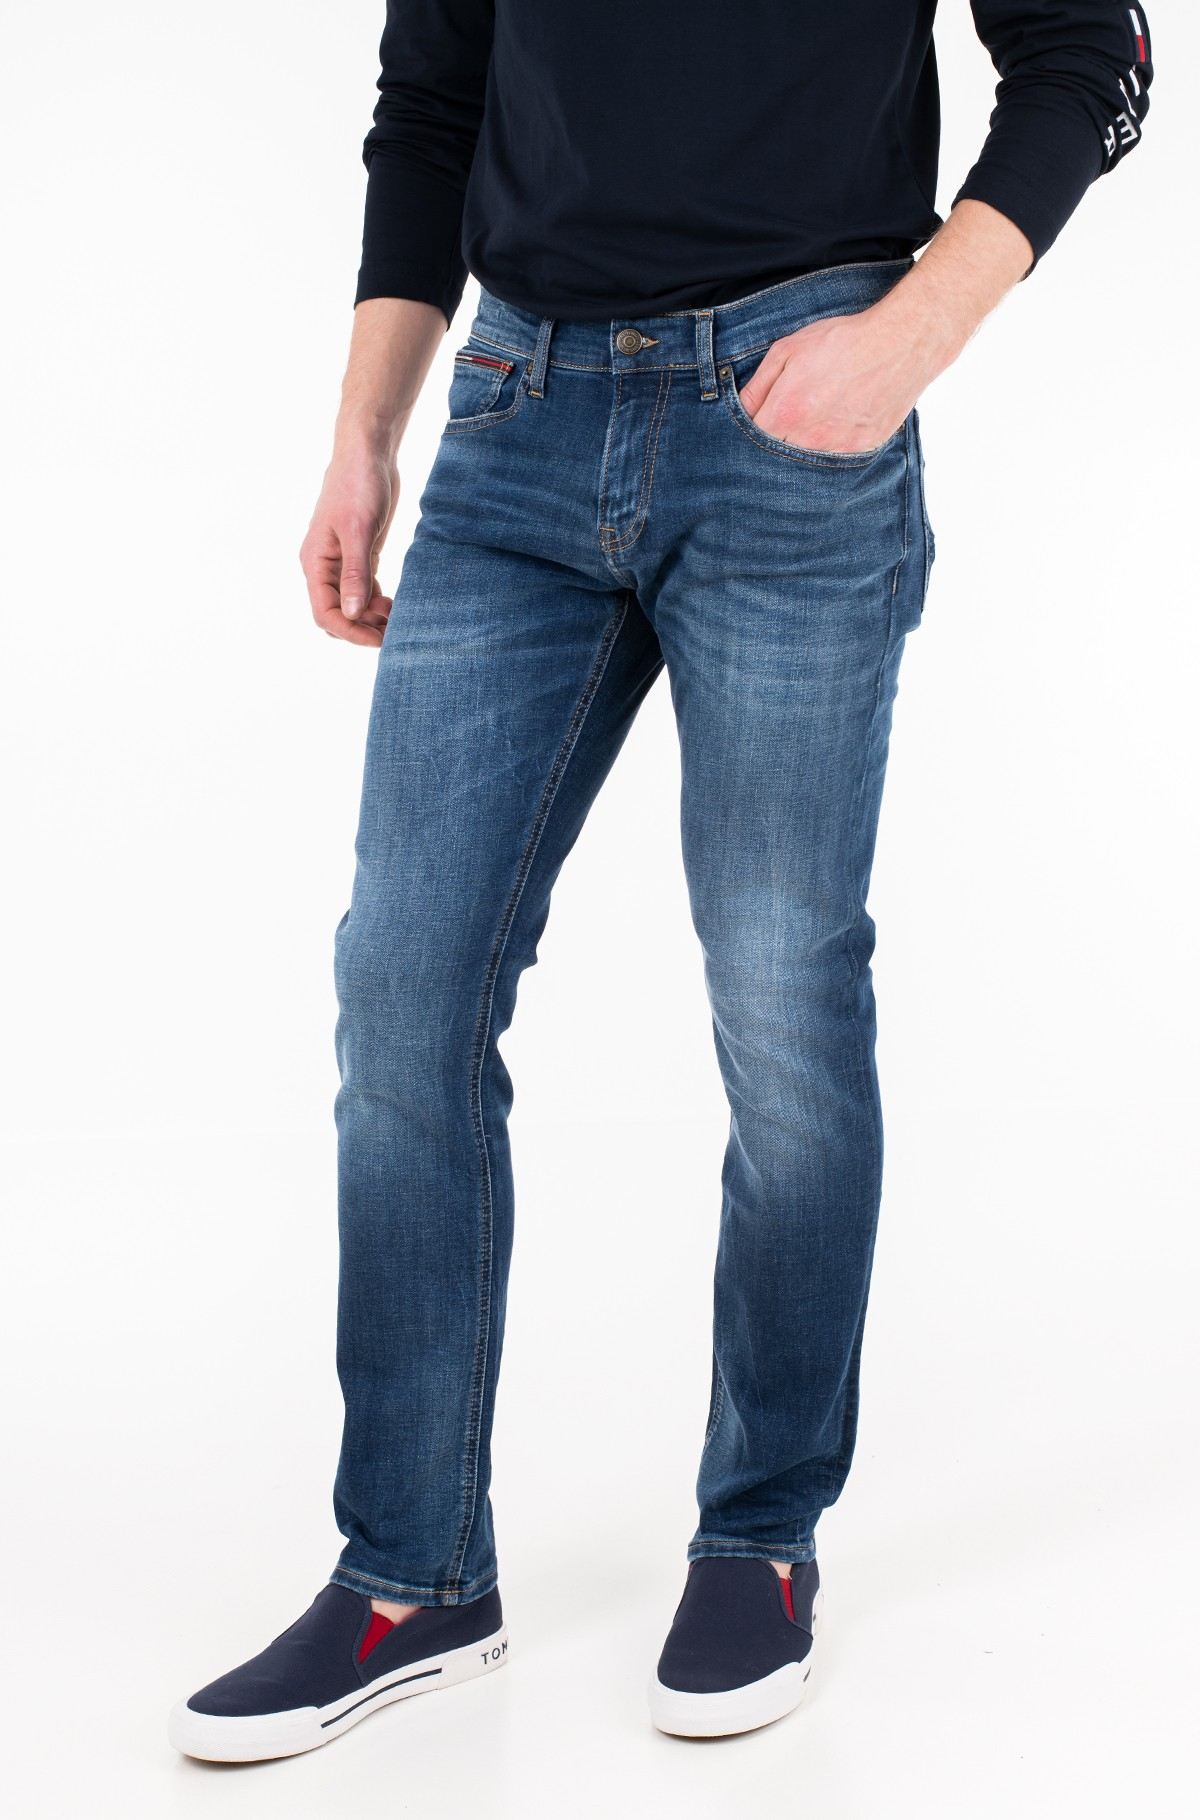 Jeans SLIM SCANTON DYMDB-full-1